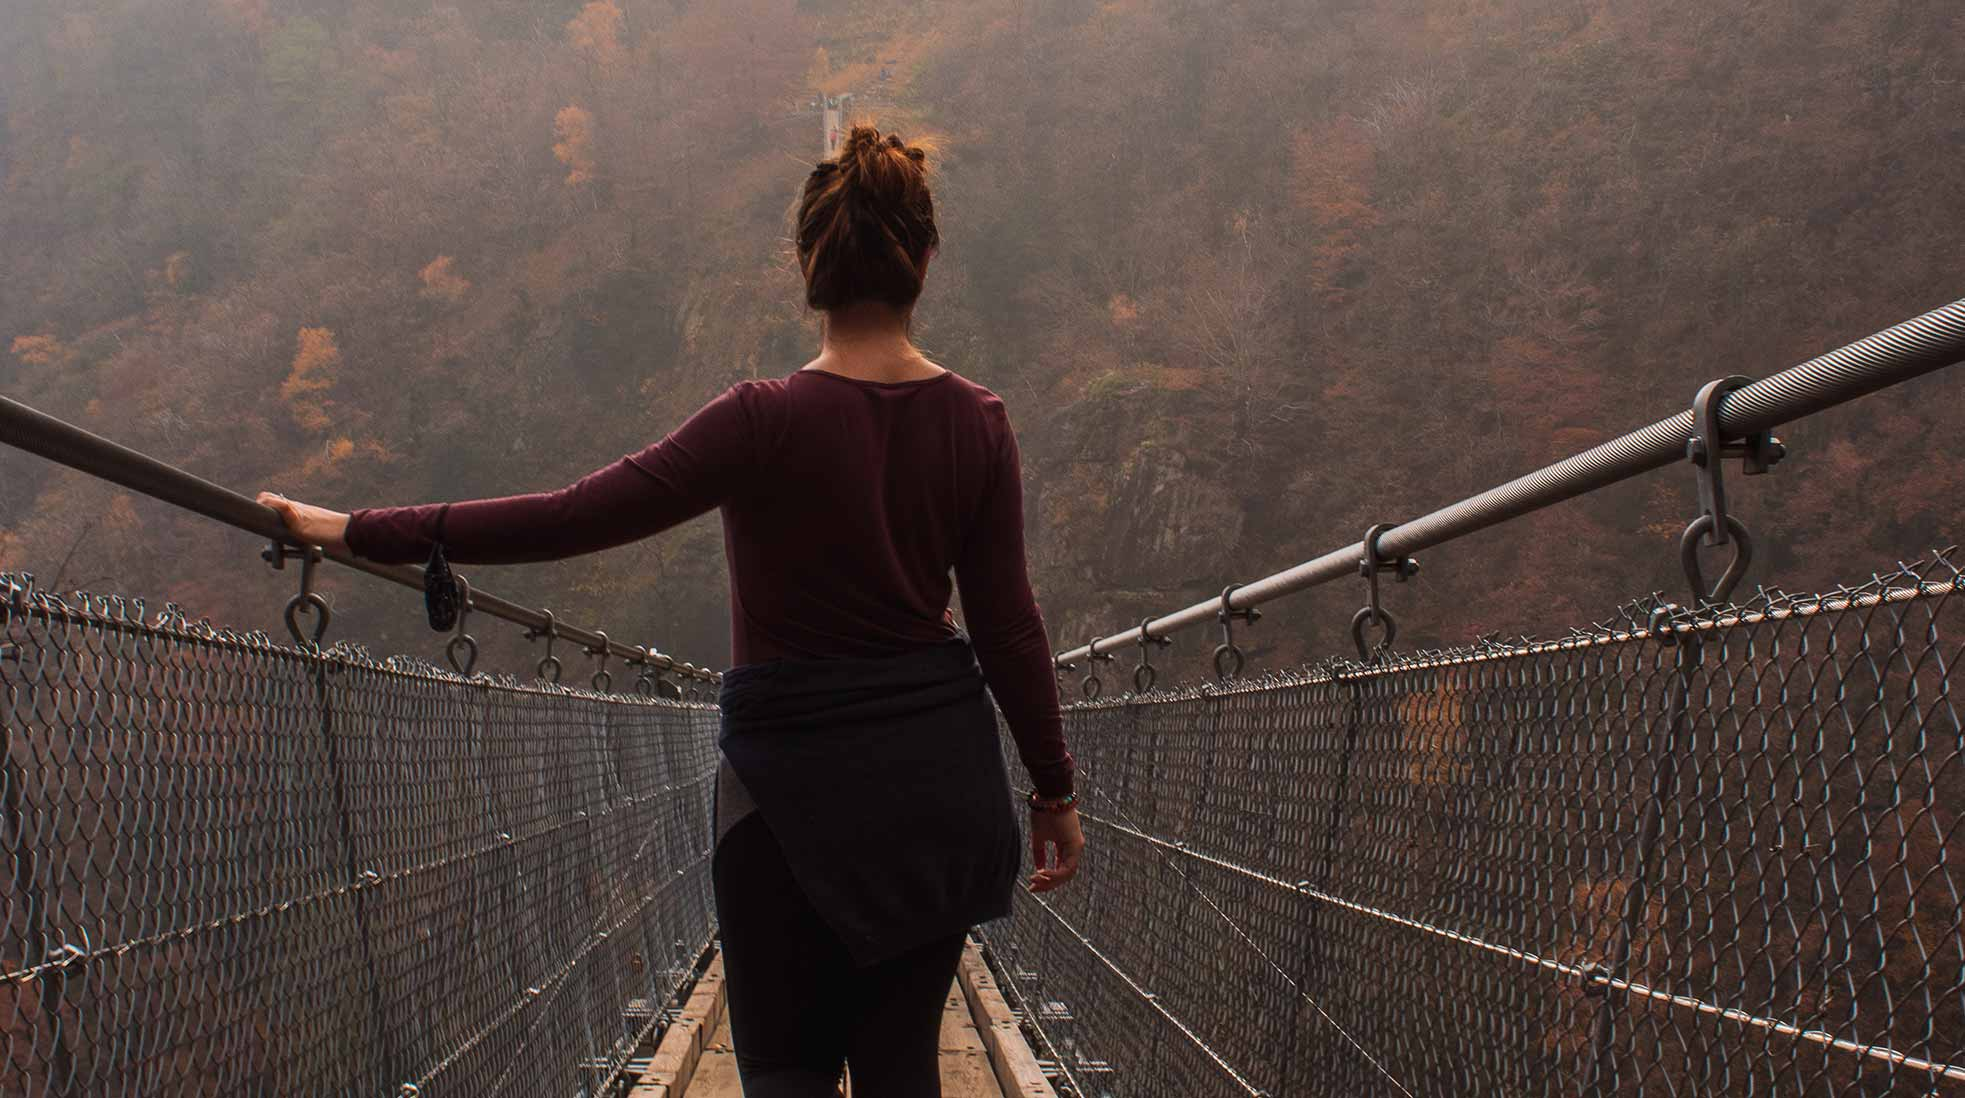 A woman walking a suspension bridge. Photo: Susanna Marsiglia / Unsplash